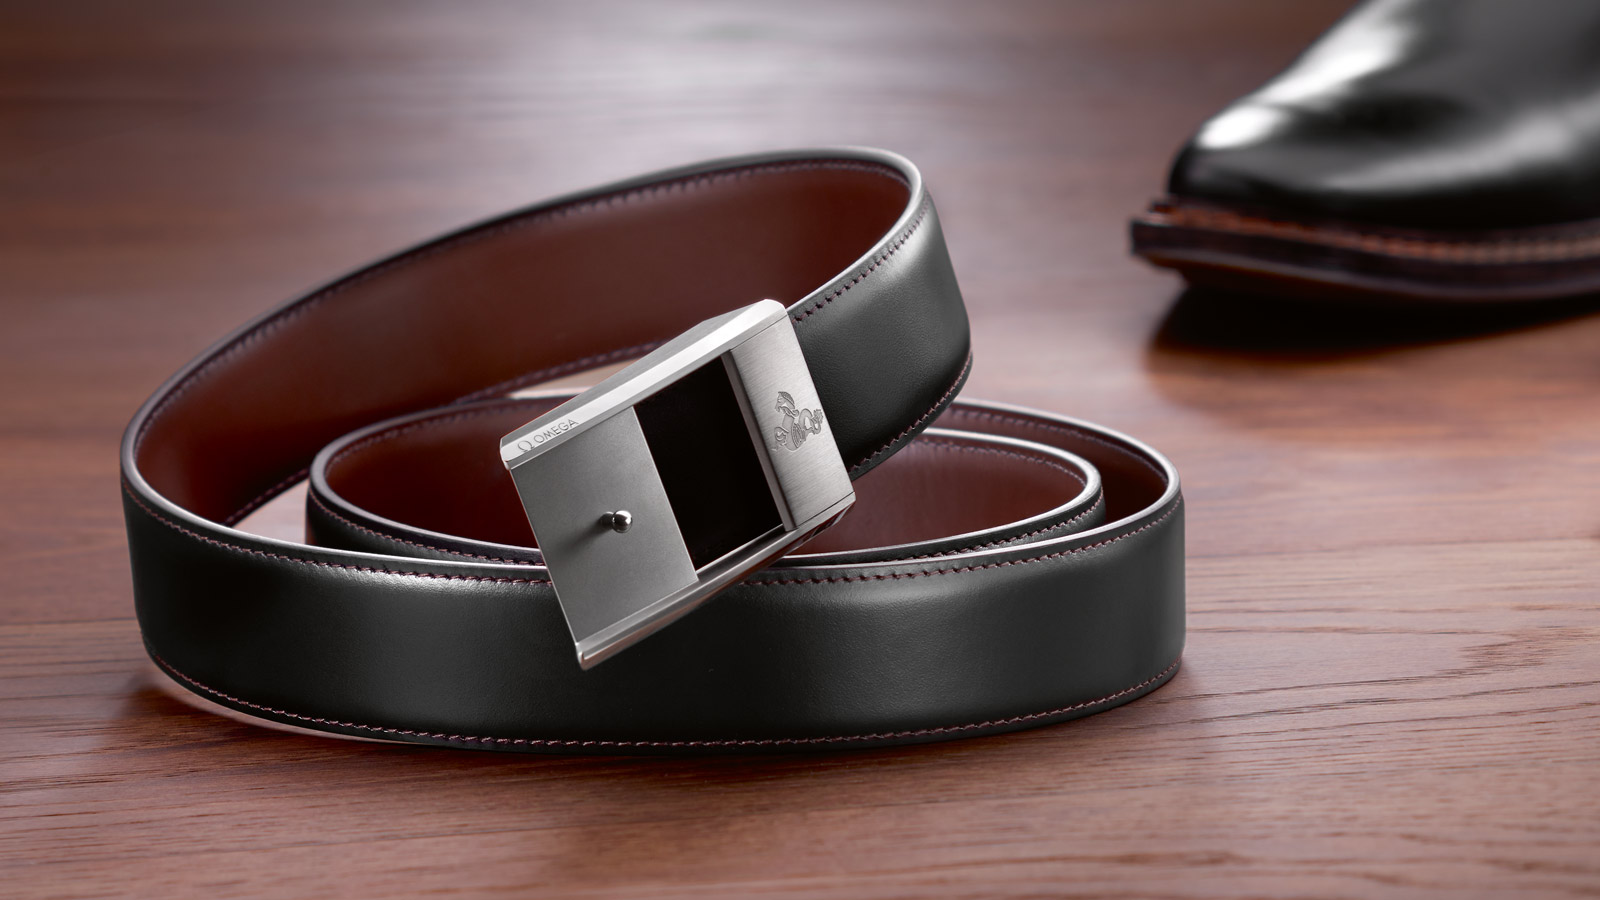 Omega fine leather belt, Omega accessories, Omega fine leather goods